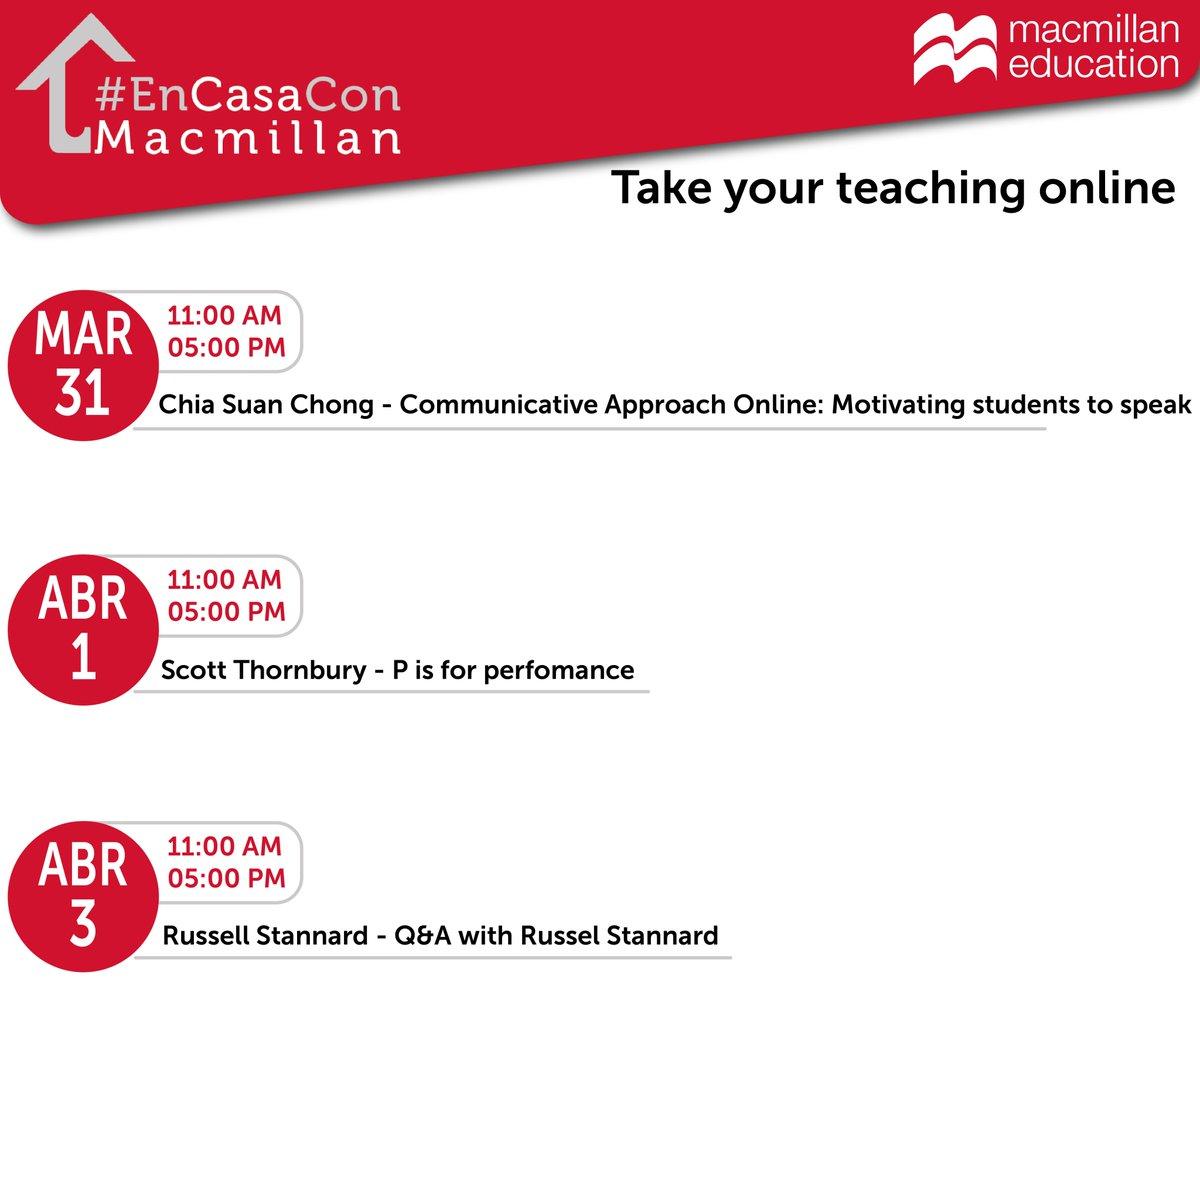 A new week means new webinars! Save the dates and join us for more online training.  #EnCasaConMacmillan #webinars #education #ELT #online #teacher #encasa #education #training